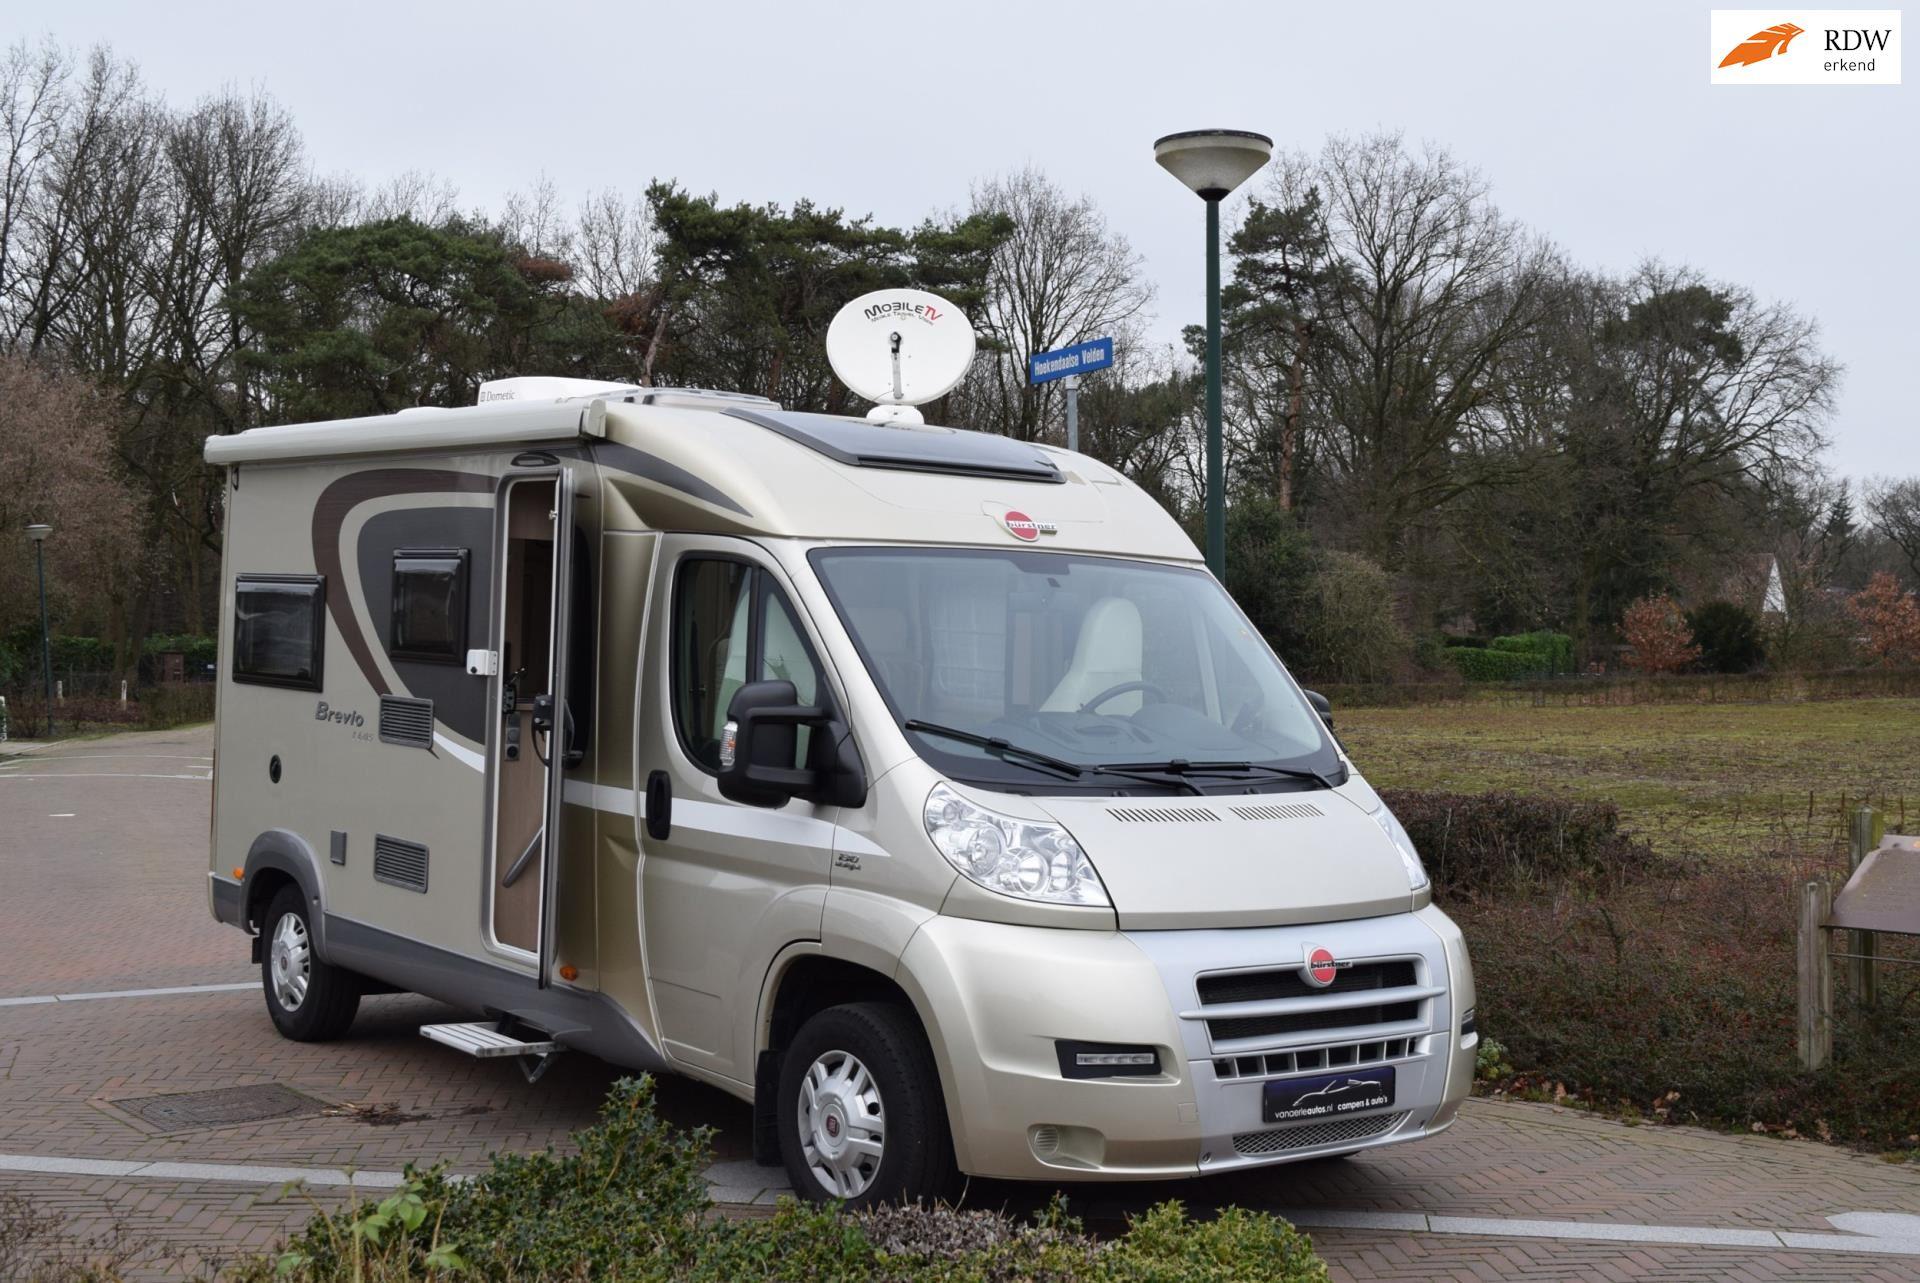 Burstner Brevio 605 Buscamper alternatief-2015-Bomvol-2x airco-Zgan occasion - Eric van Aerle Auto's